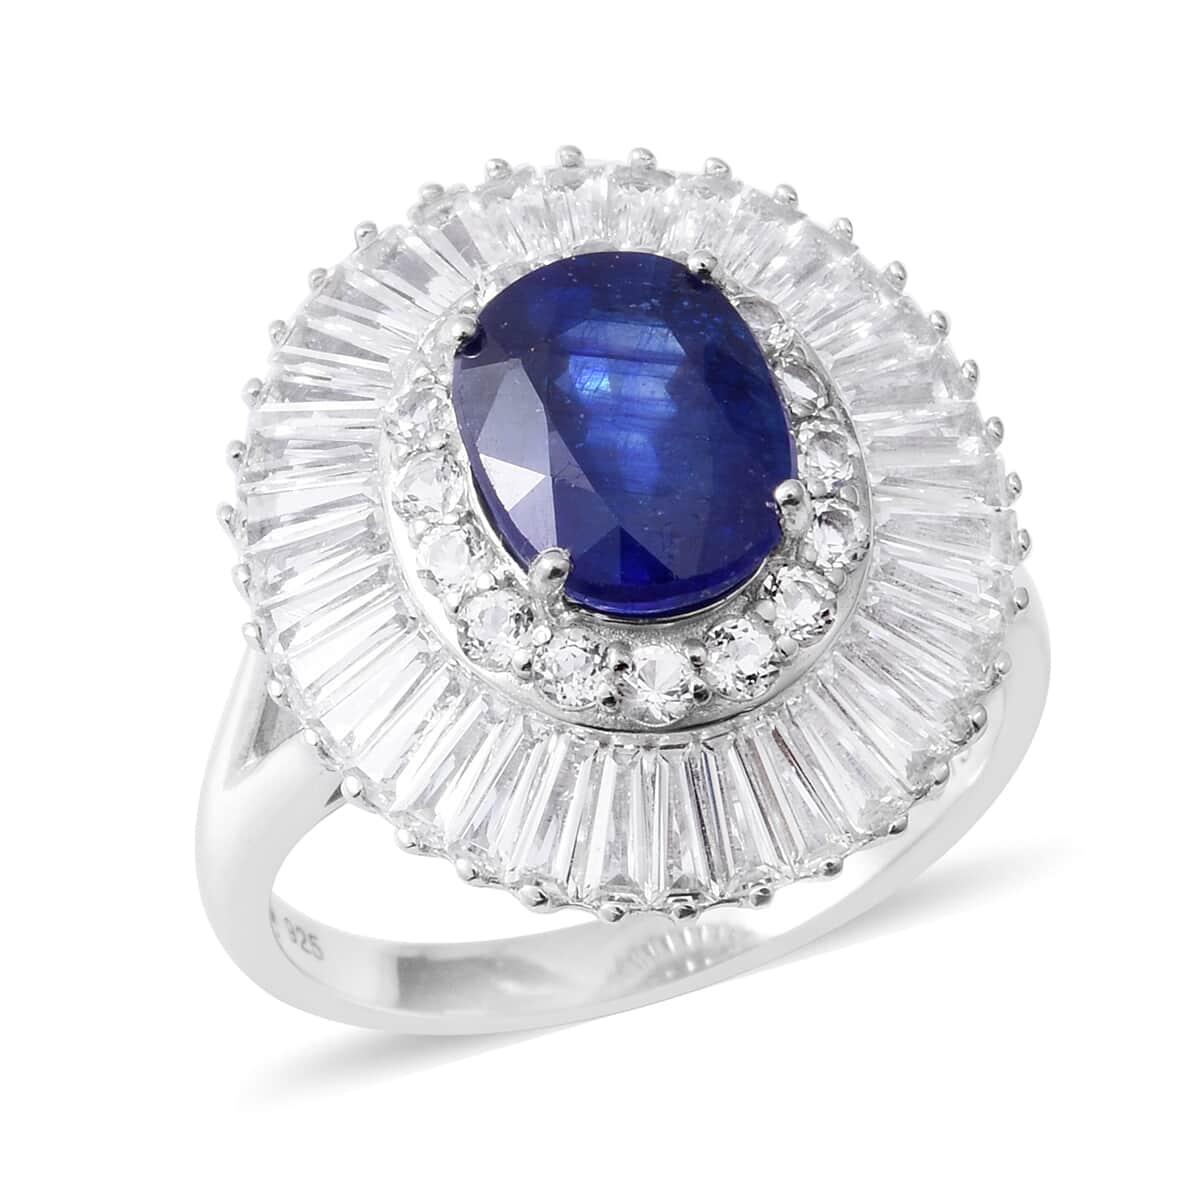 Masoala Sapphire, White Topaz Platinum Over Sterling Silver Split Cocktail Ring (Size 8.0) TGW 9.79 cts.